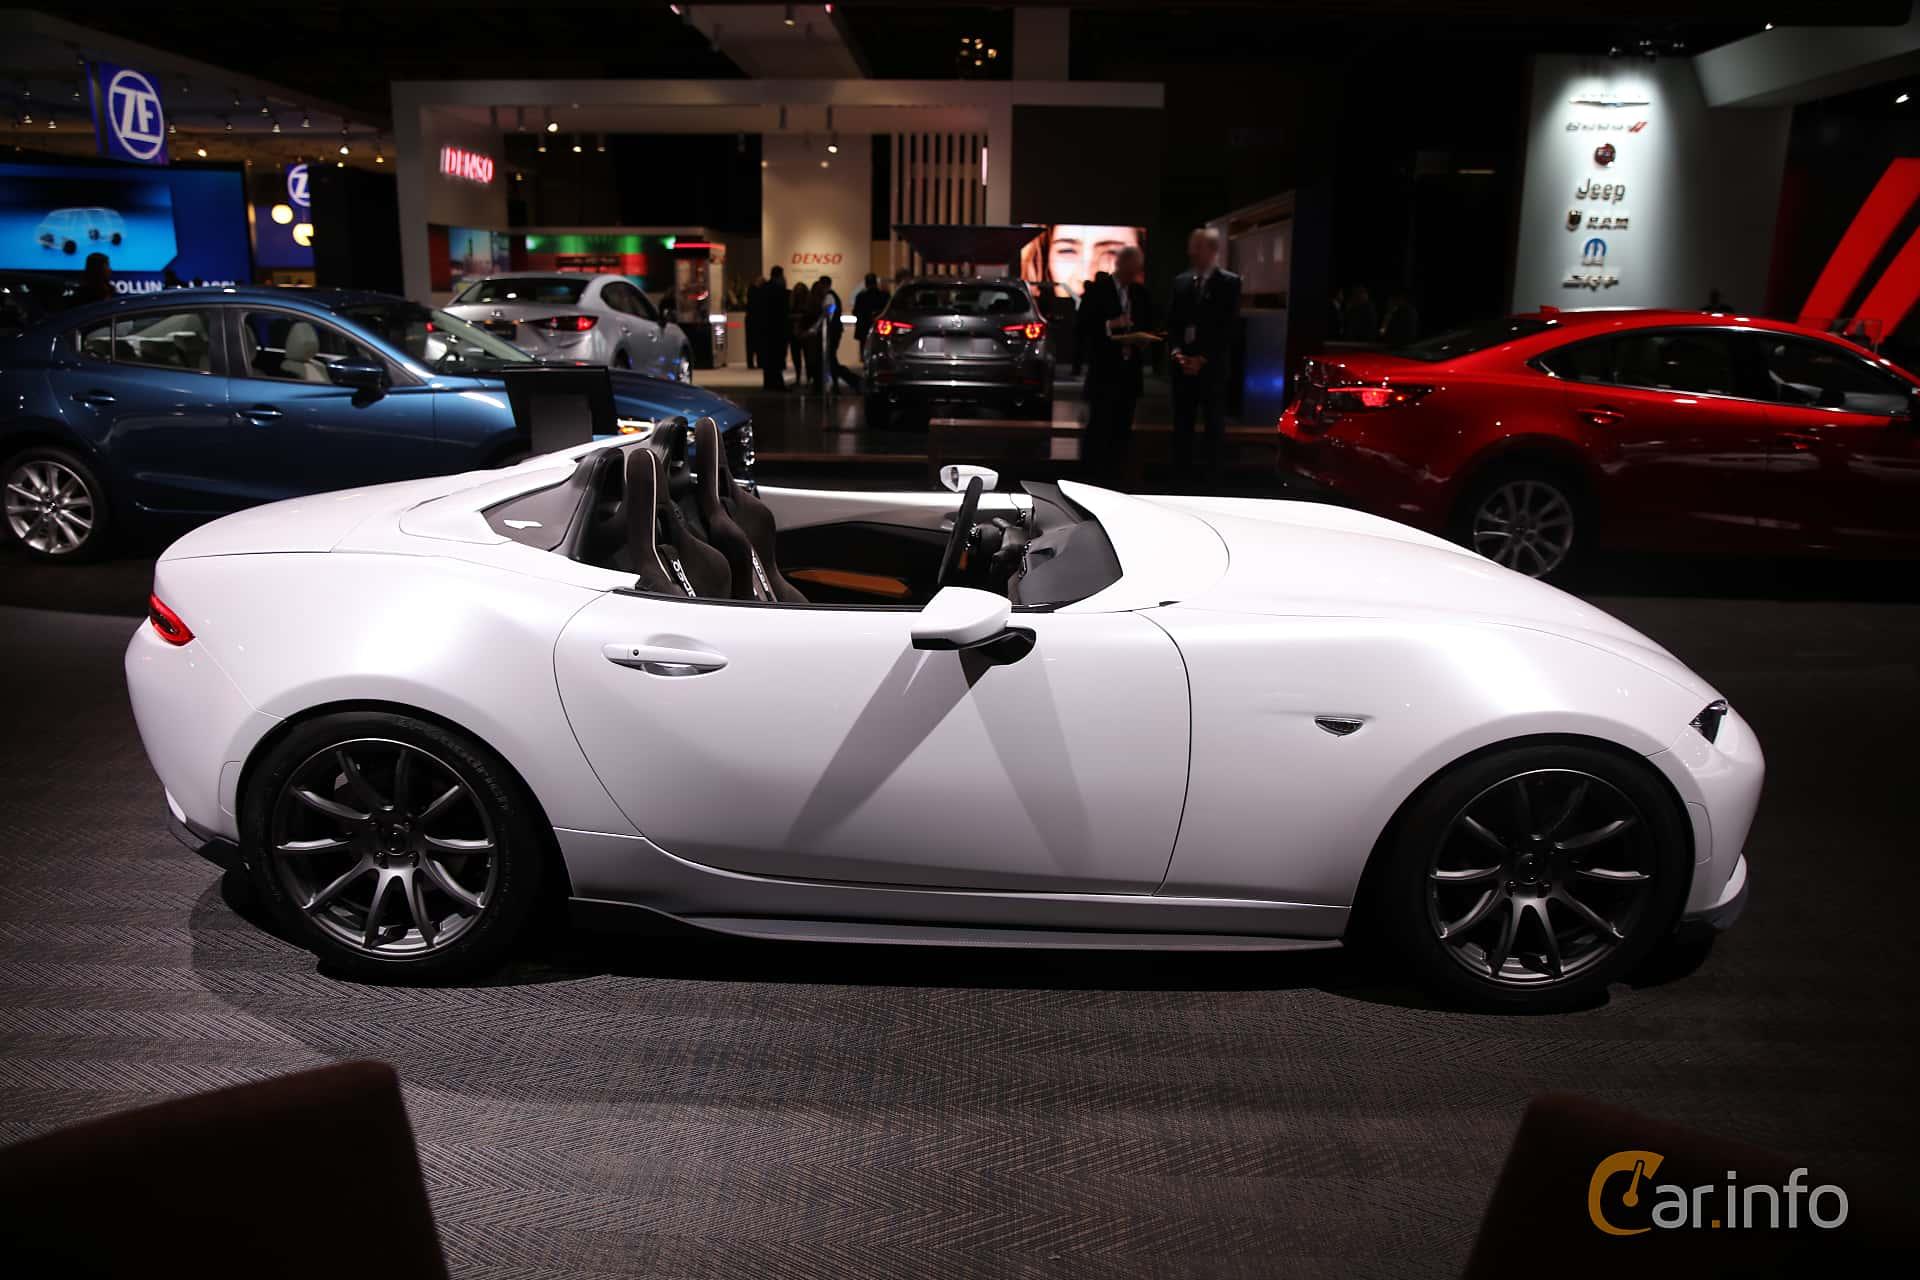 https://s.car.info/image_files/1920/mazda-mx-5-miata-speedster-evolution-side-north-american-international-auto-show-2017-2-318259.jpg